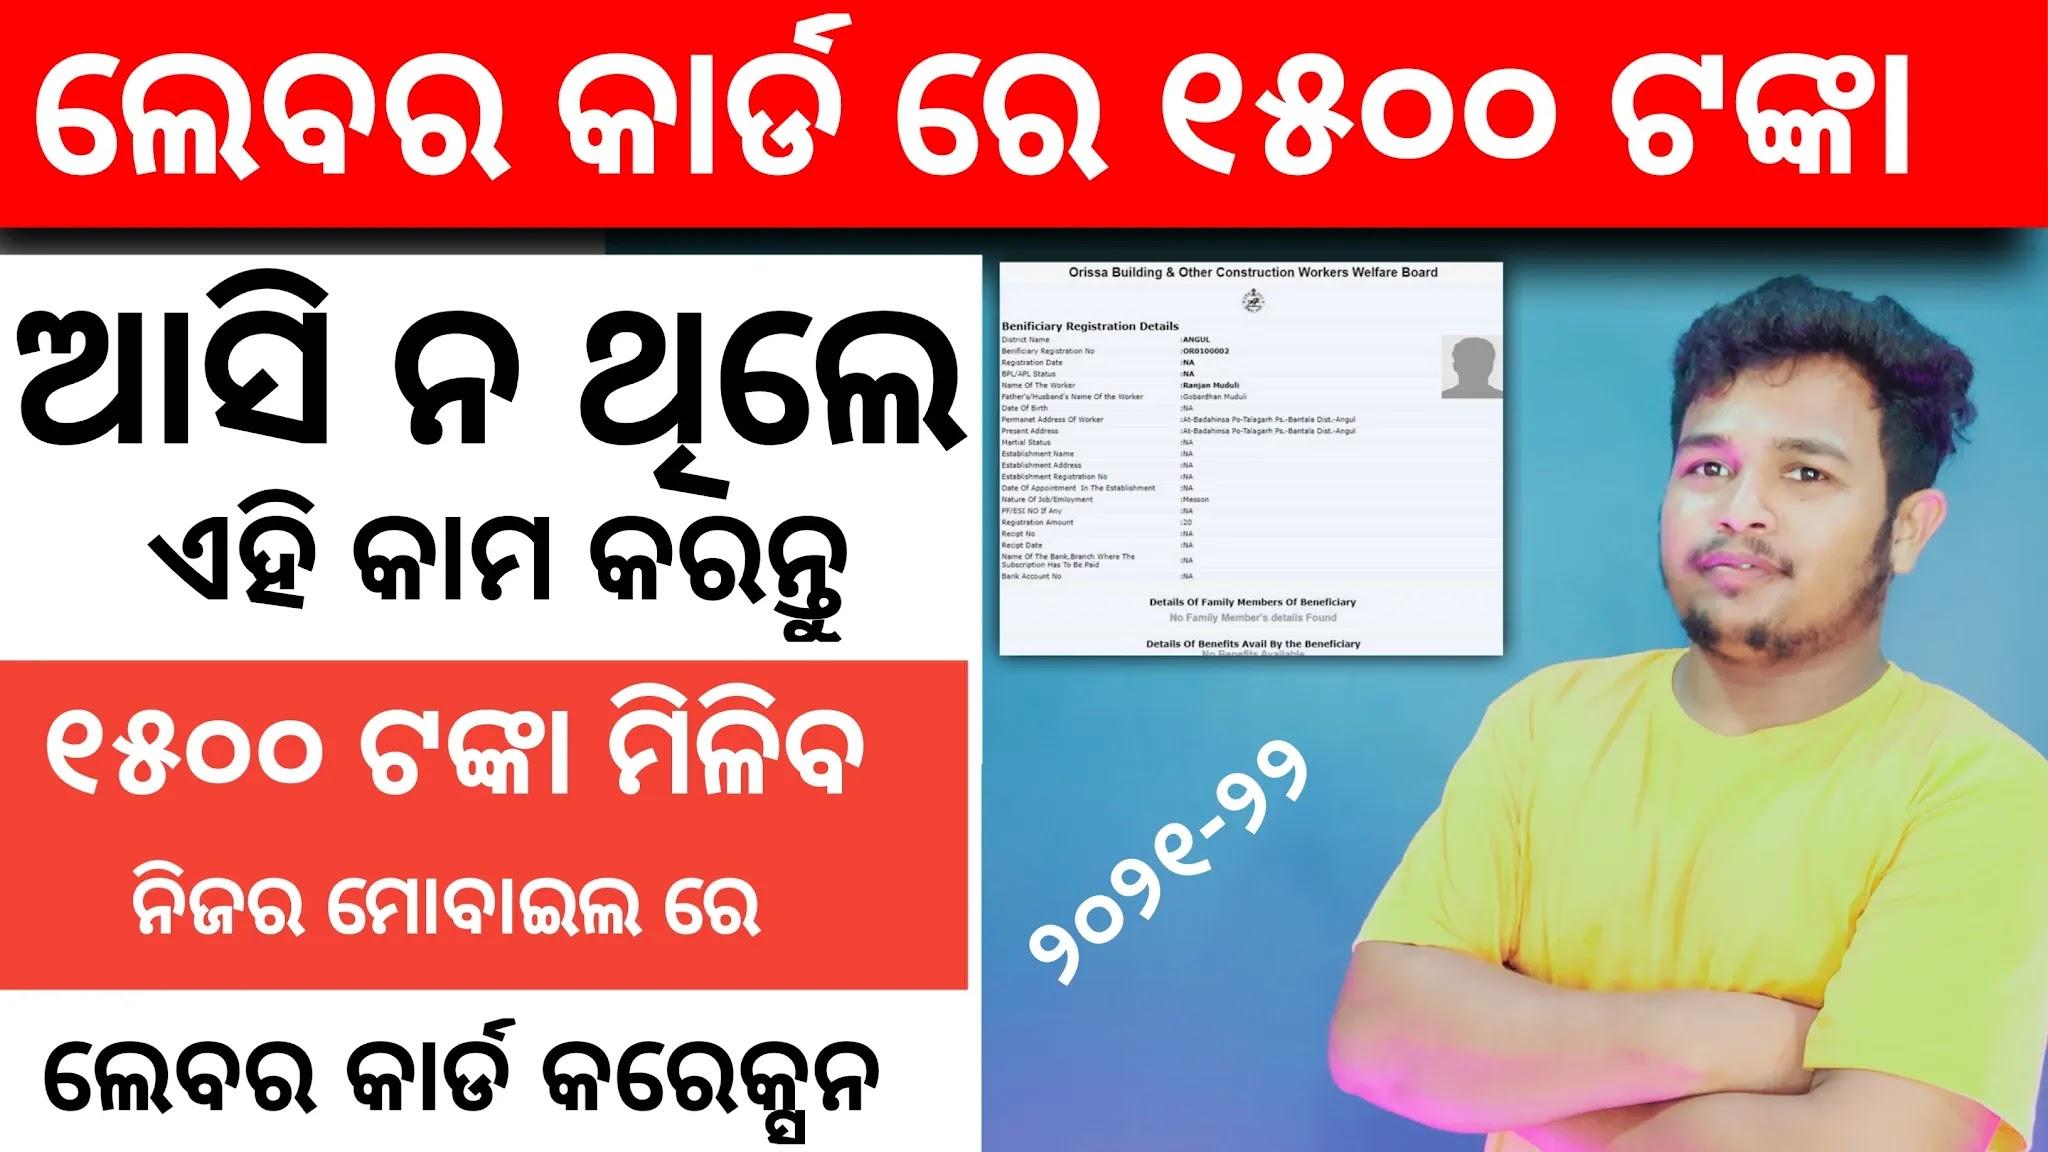 labour card money status odisha